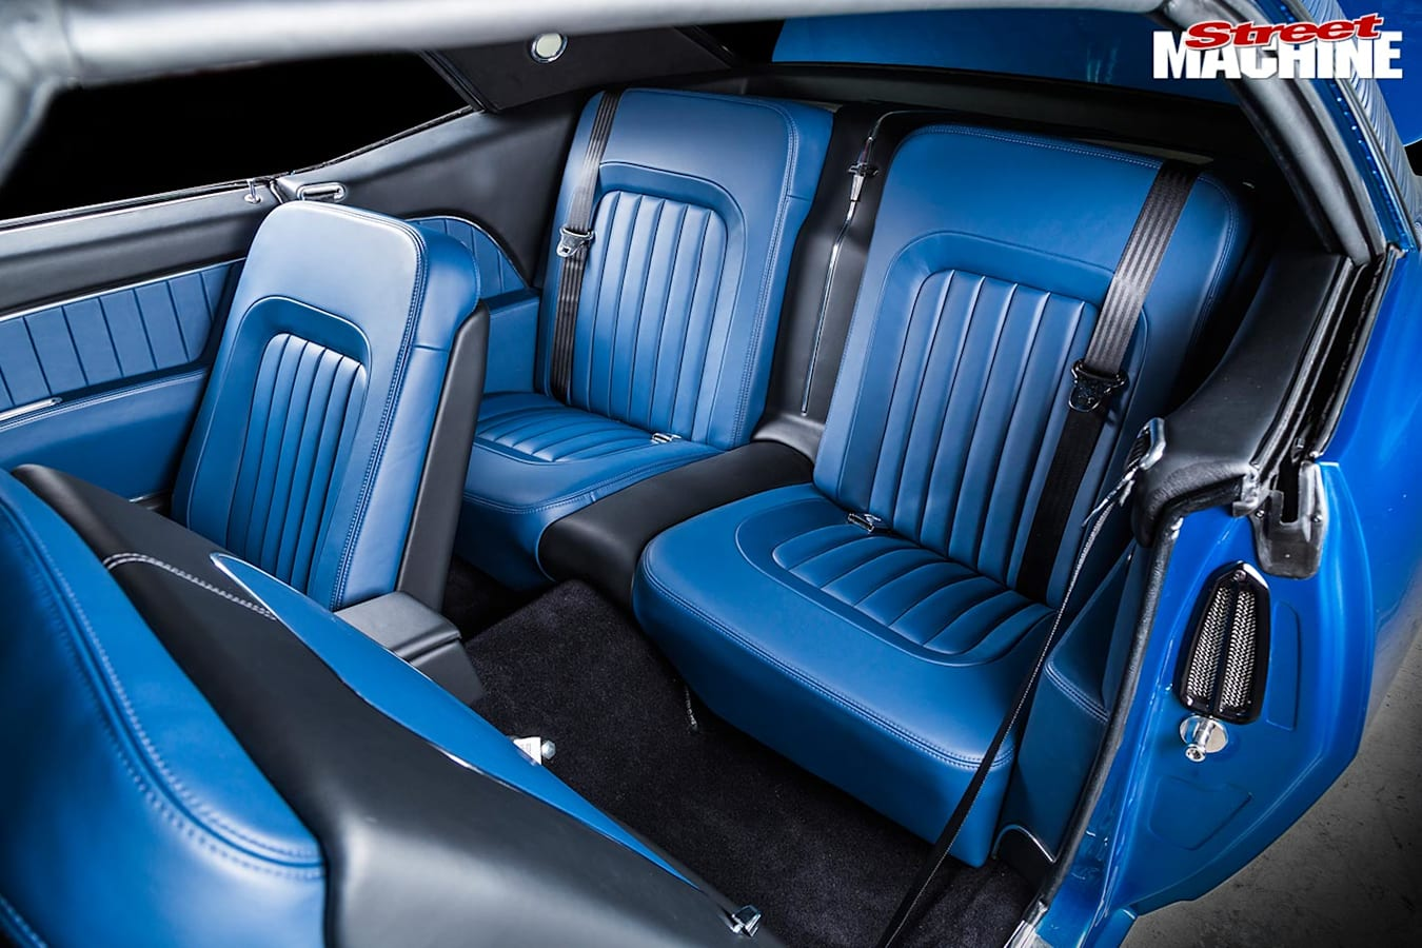 Chev Camaro seats